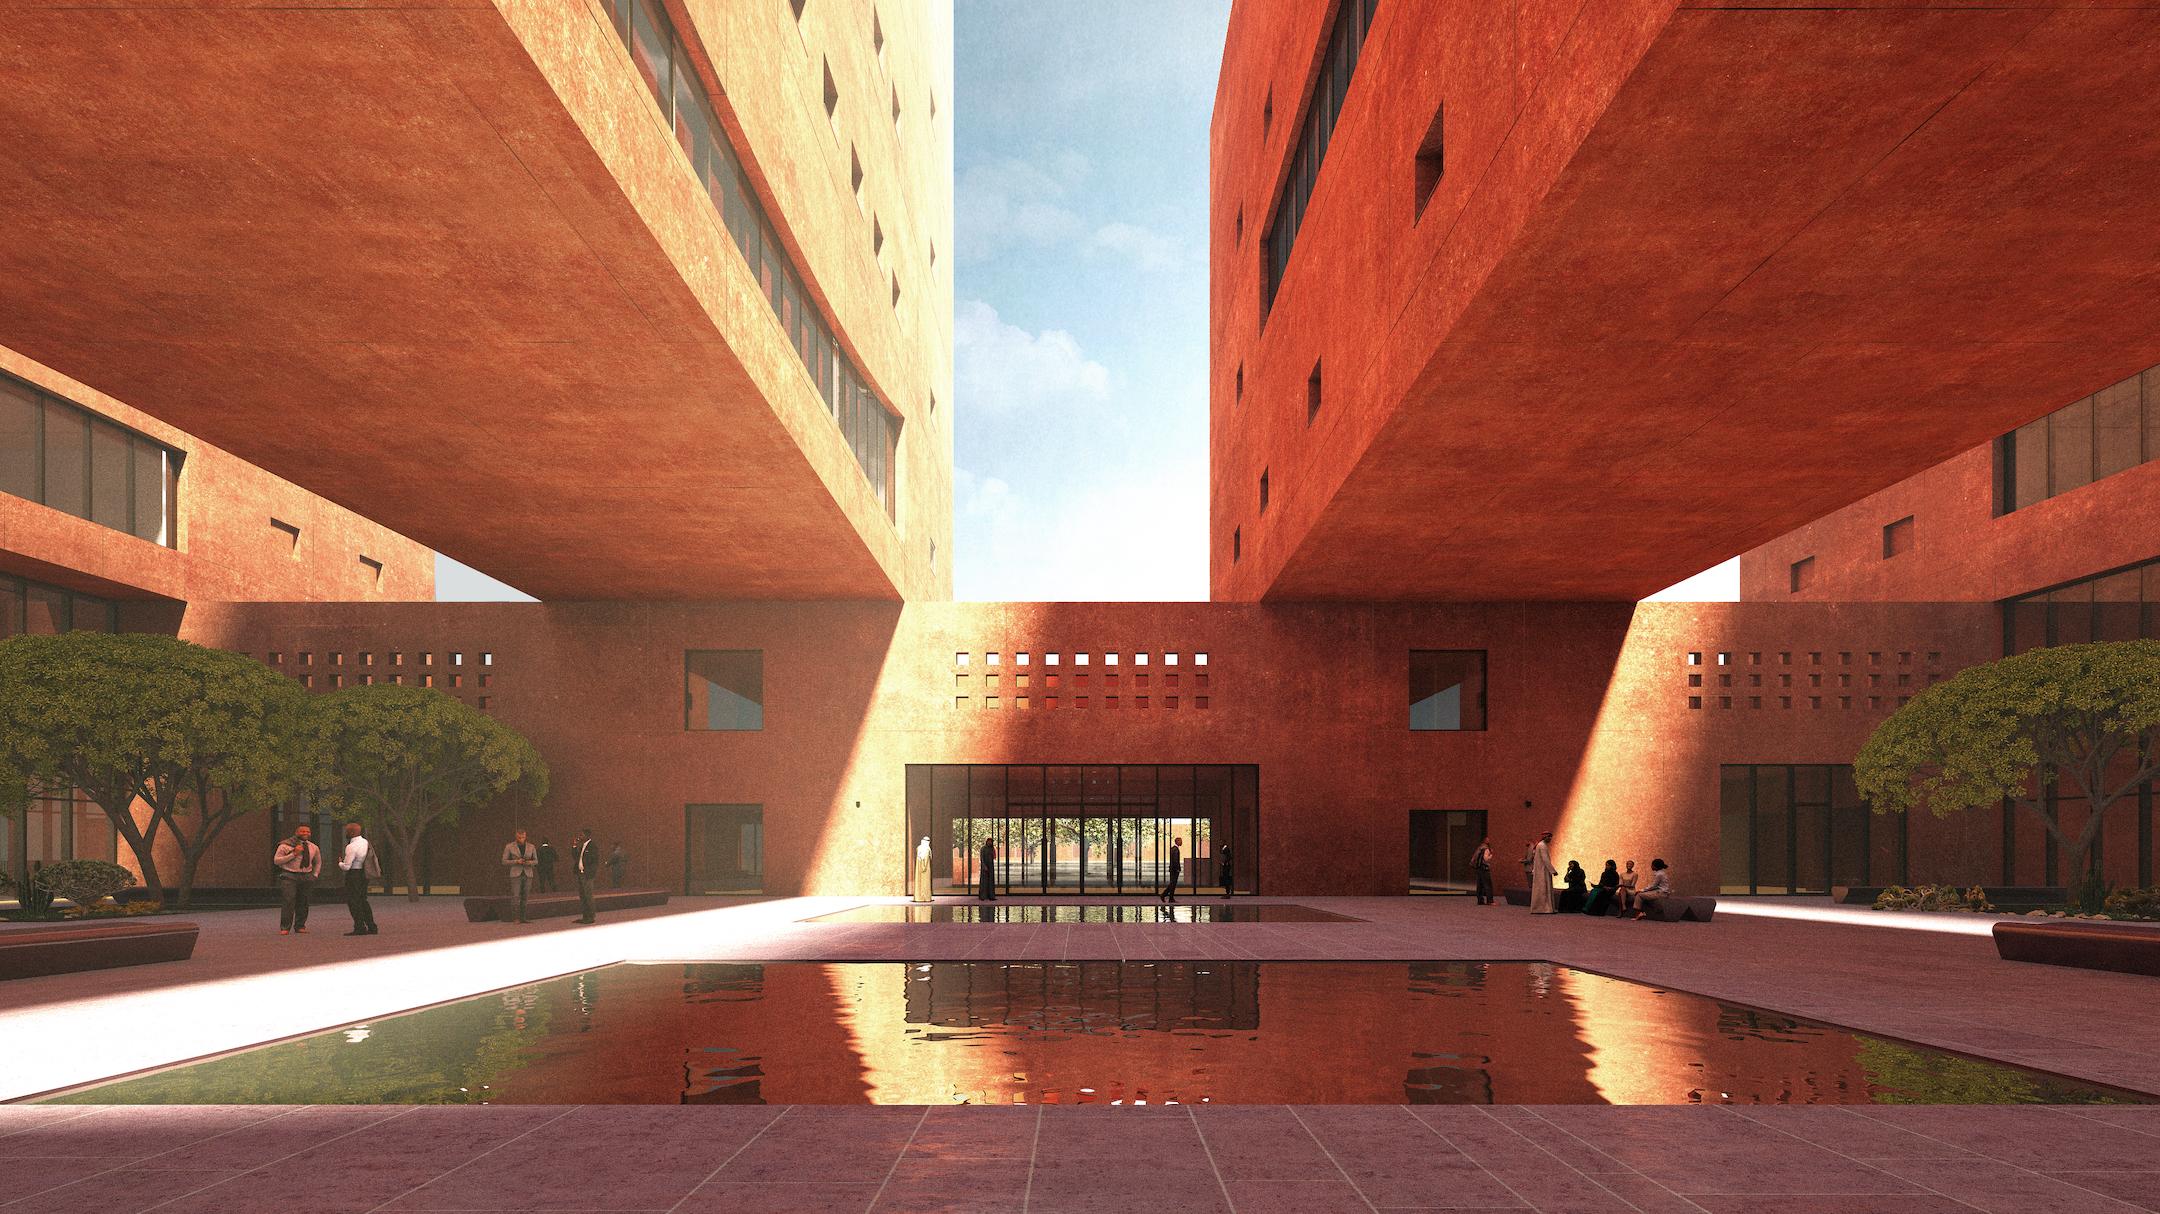 Award-winning Ghanaian-British Architect Sir David Adjaye's Star is Ascendant and Bright The Africa Institute_Adjaye Associates